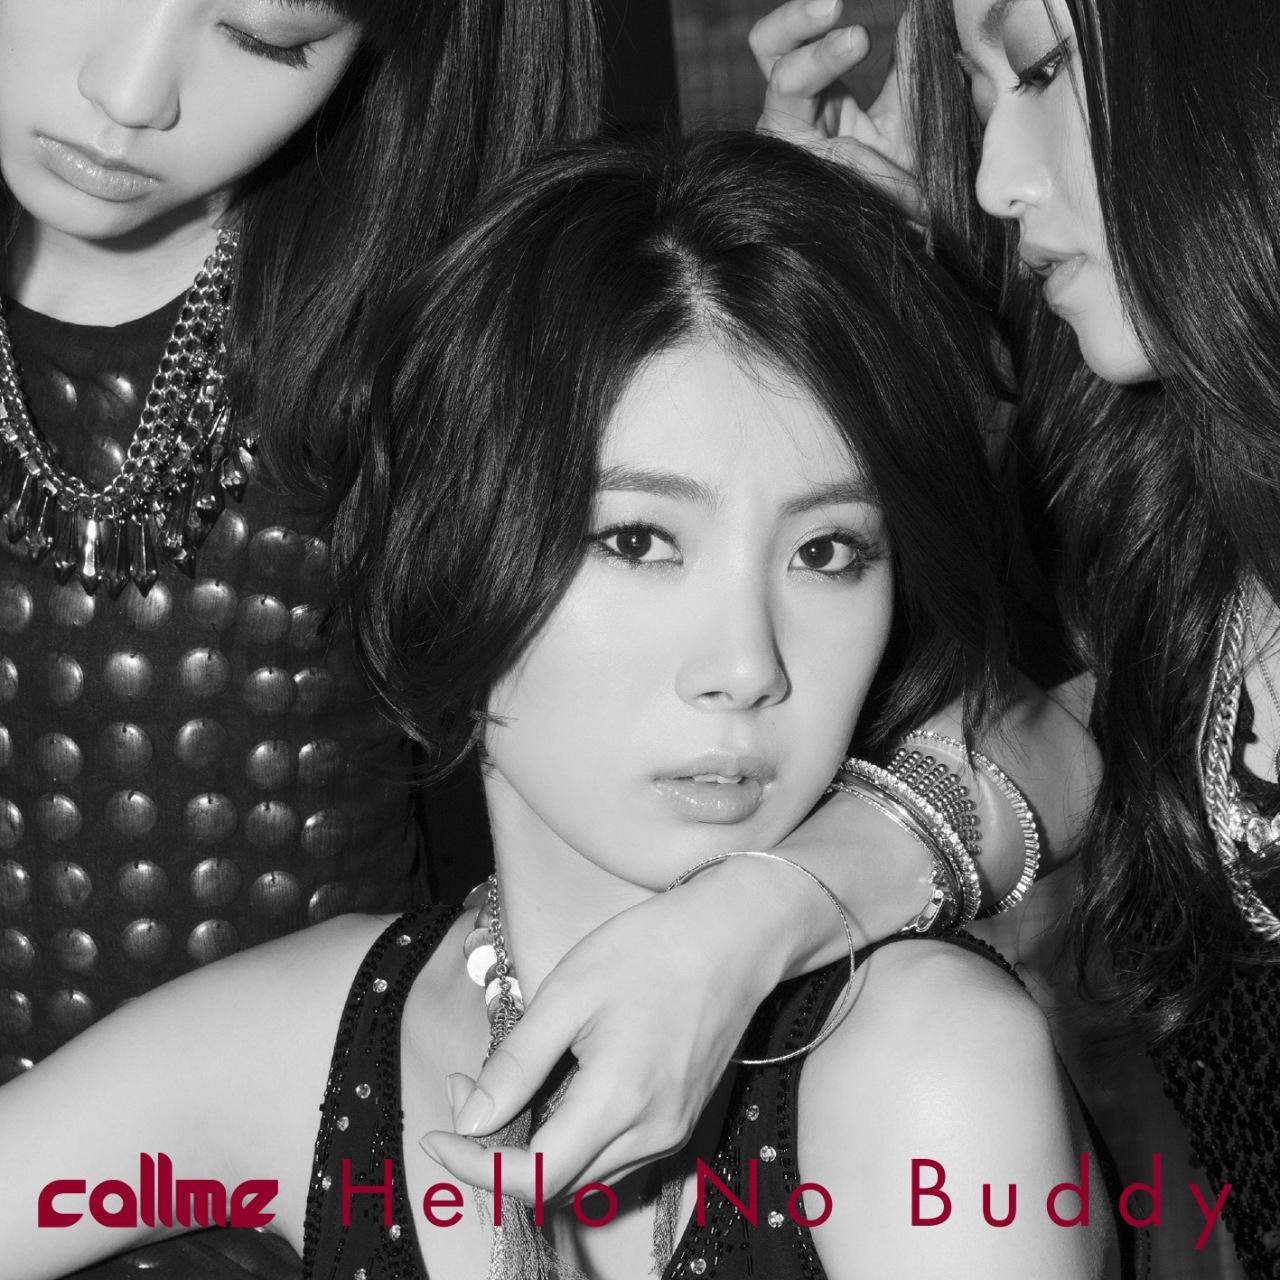 calllme 3月7日リリースの新曲「Hello No Buddy」収録内容を発表